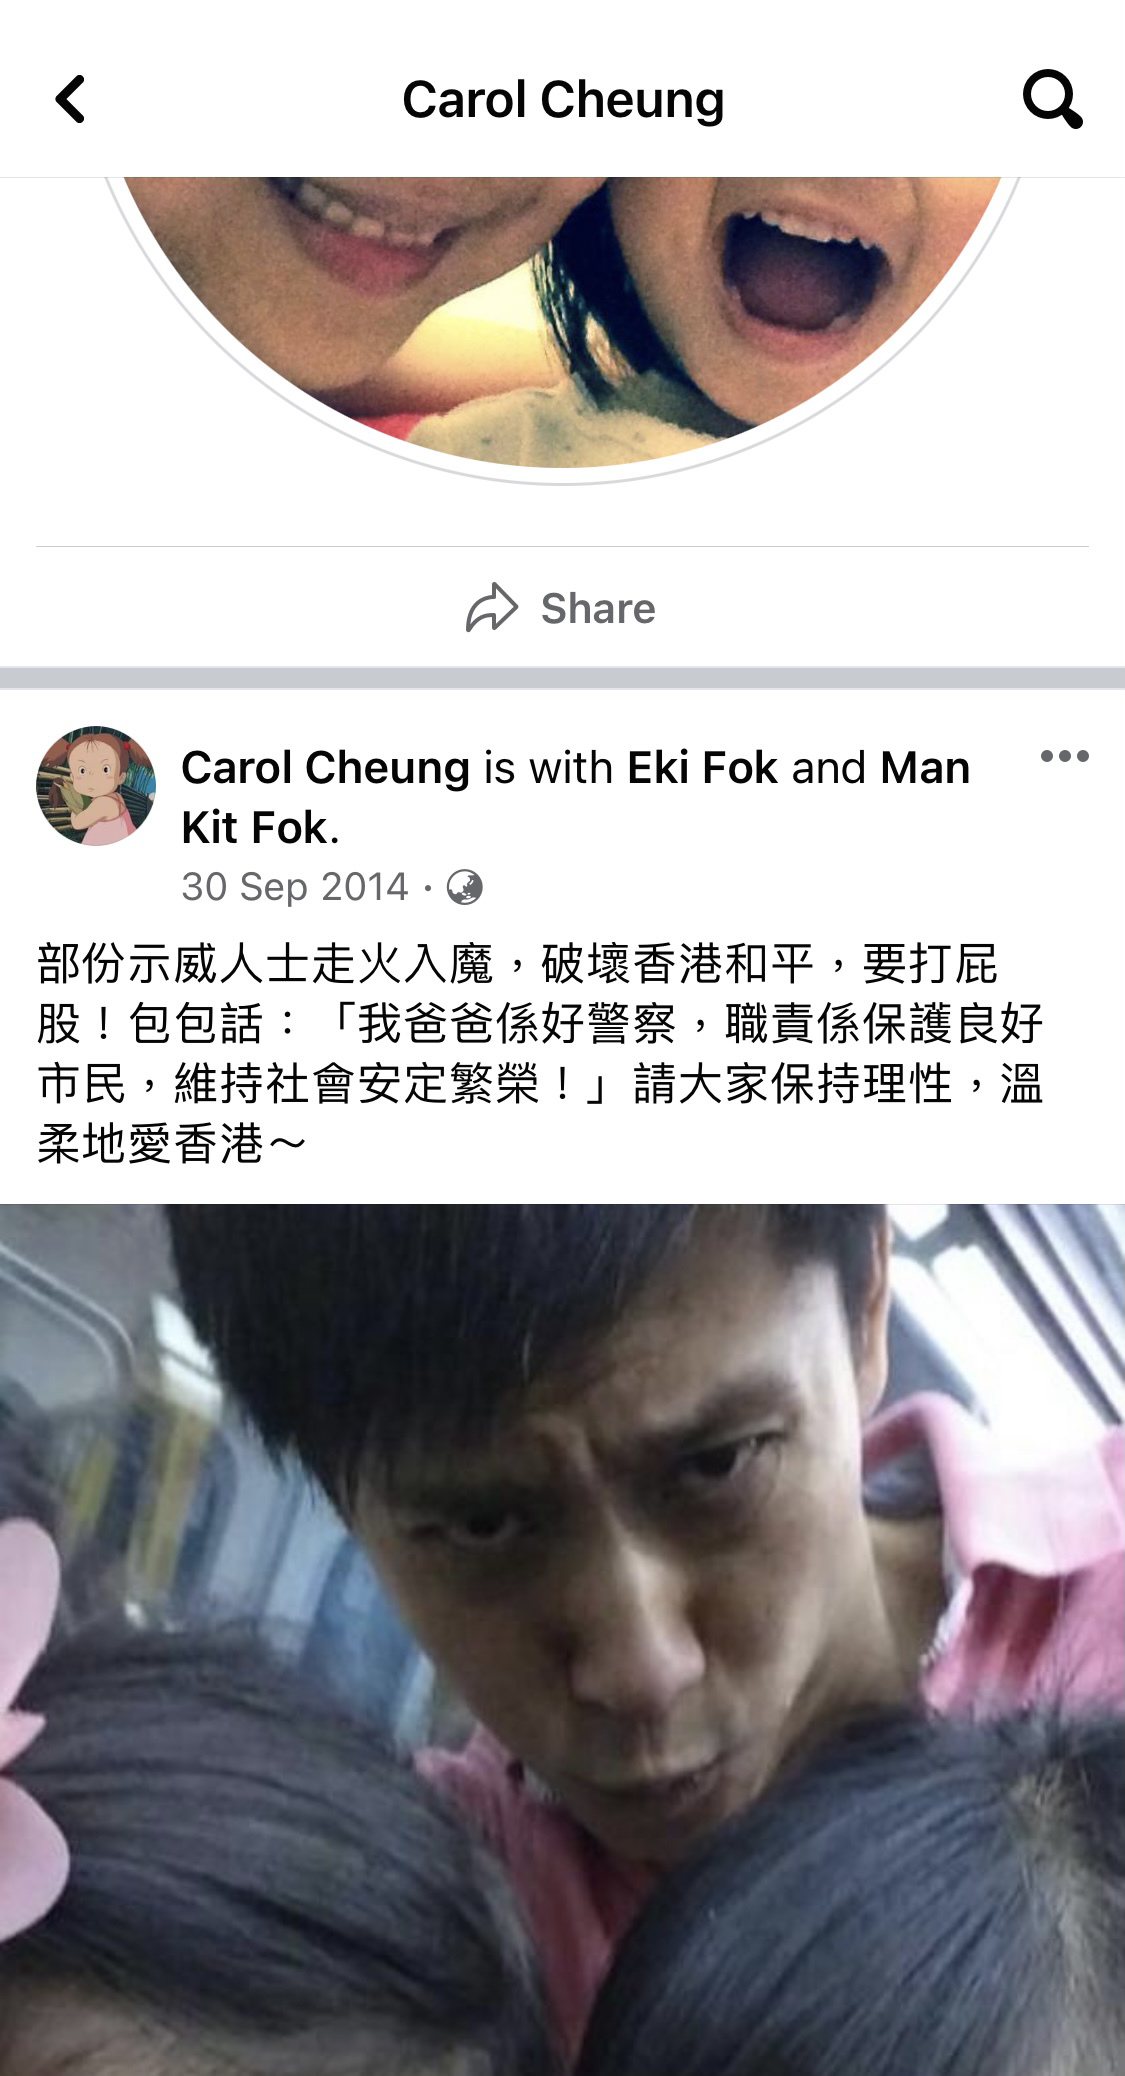 https://upload.hkgolden.media/comment/xaa4gsoi.0ixl4qvthrt.zxw443041tm.y3p.jpg